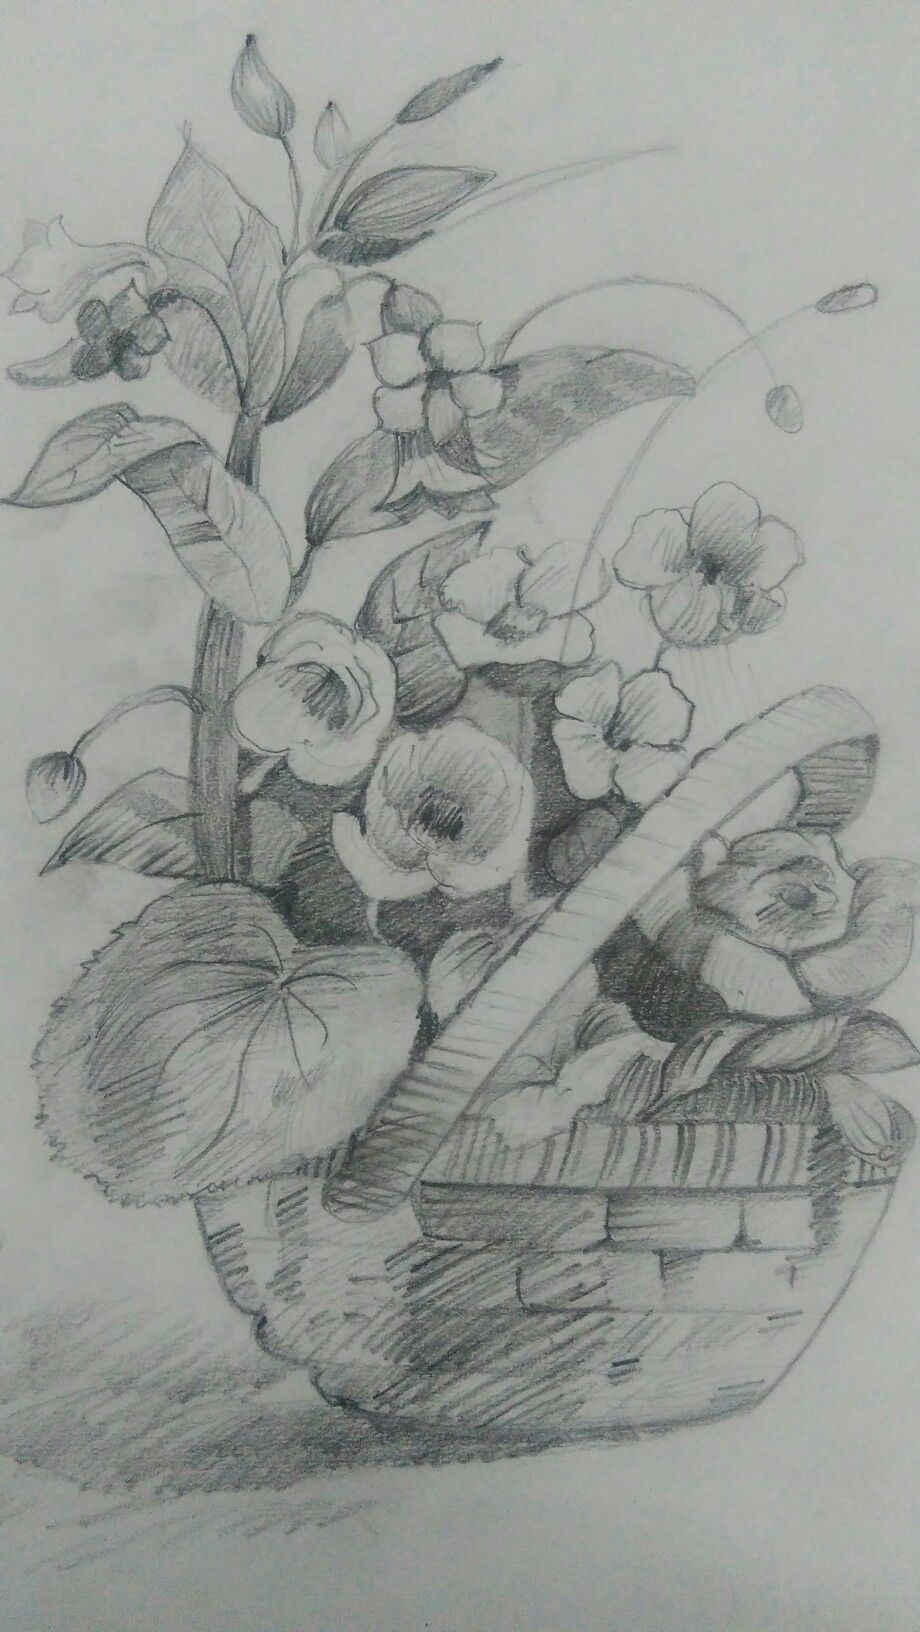 Still Life Shading Drawings Pencil - 0425